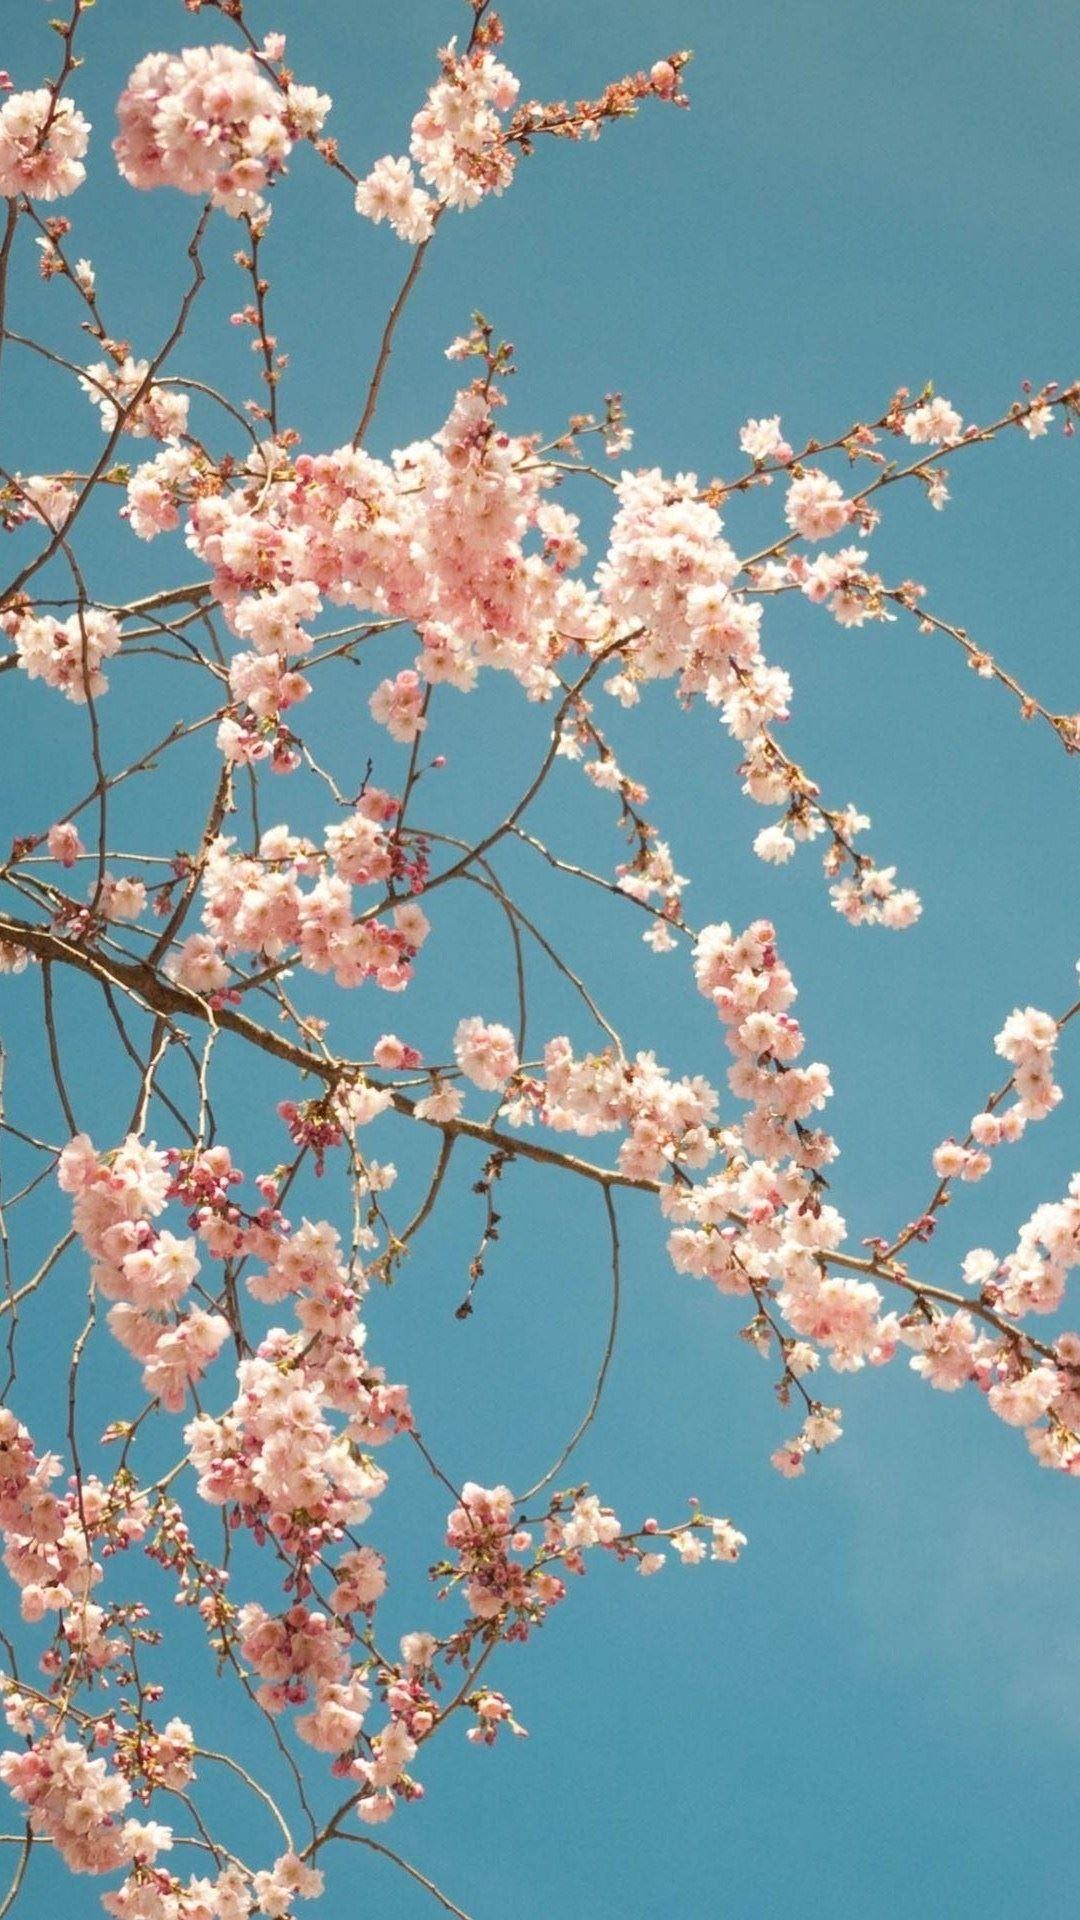 Cherry Blossom Tree Iphone 6 Plus Hd Wallpaper Cuteiphonewallpaperstumblr Iphonewallpapers Manzara Fotografciligi Resim Duvari Resim